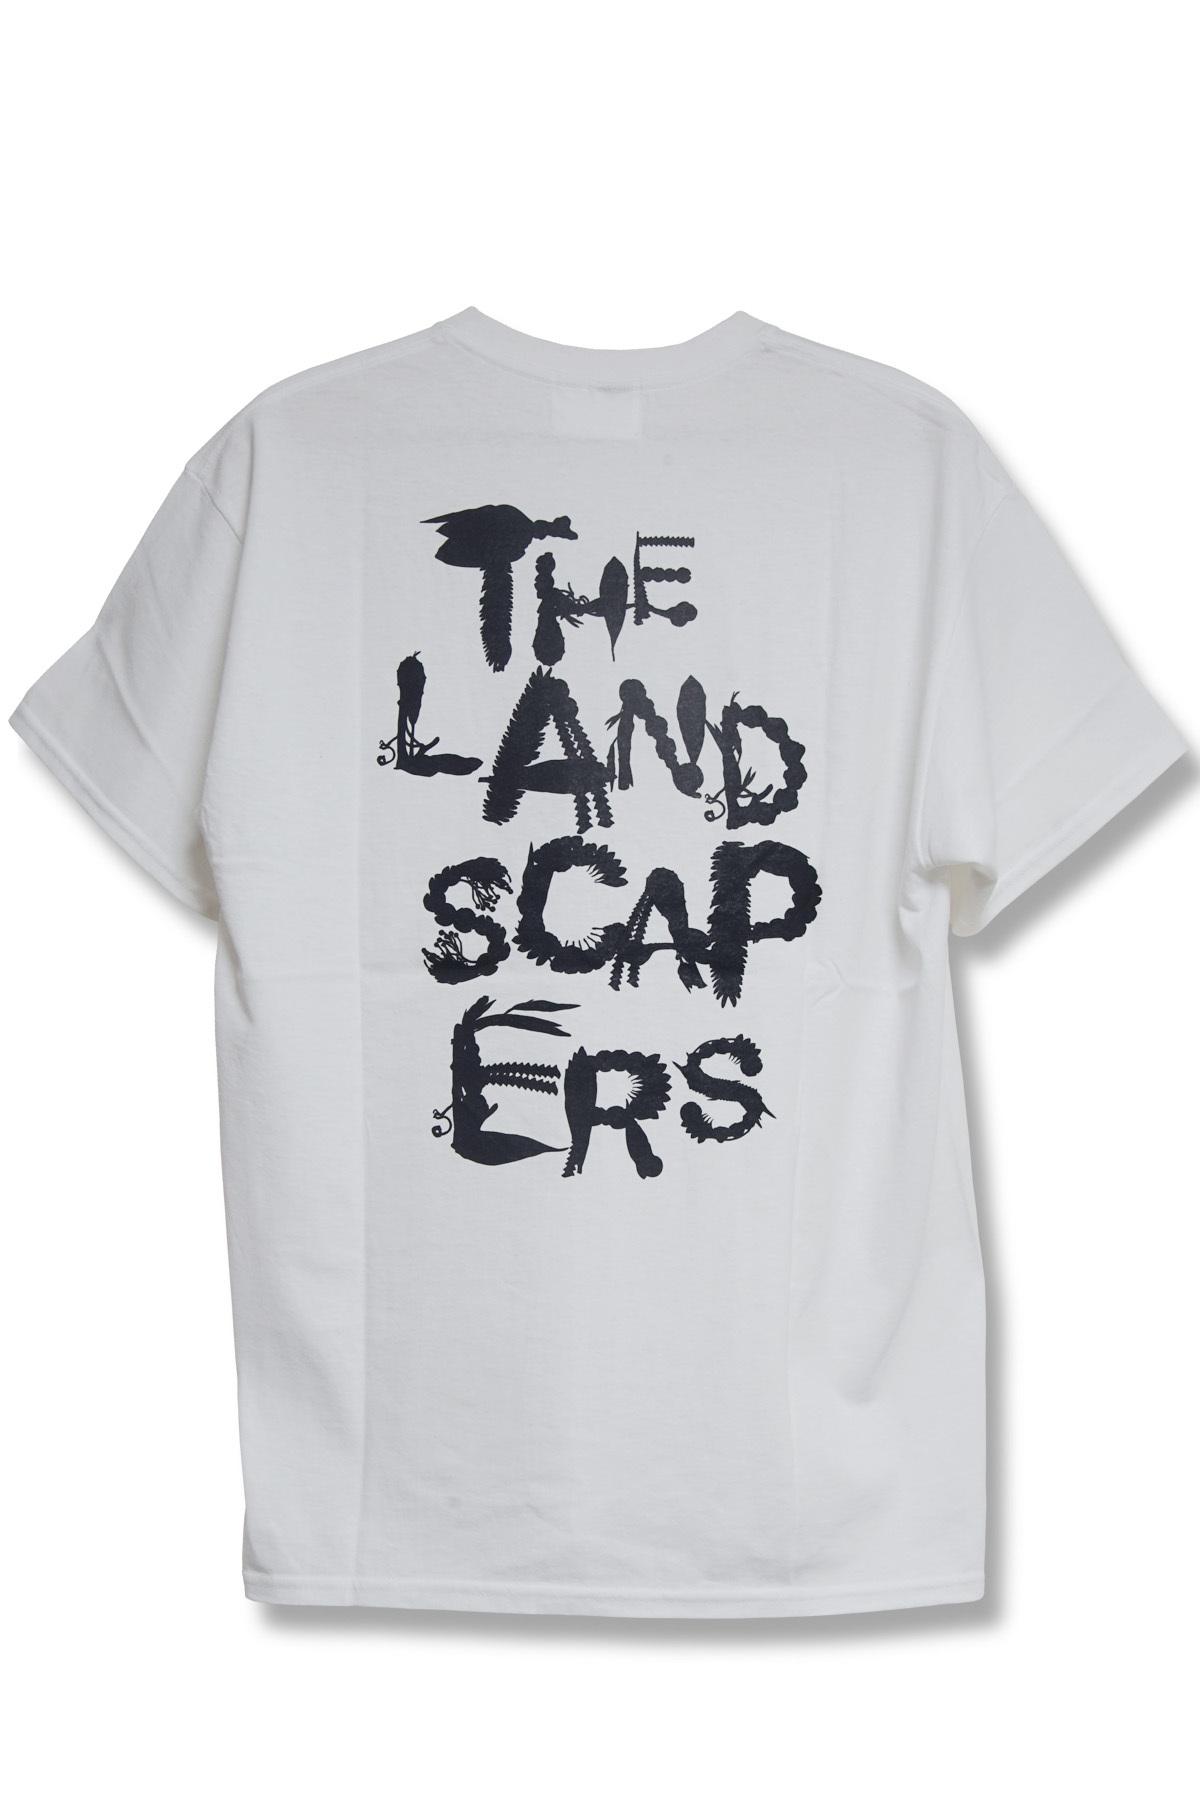 The Landscapers S/S Pocket T-Shirt(Men's)